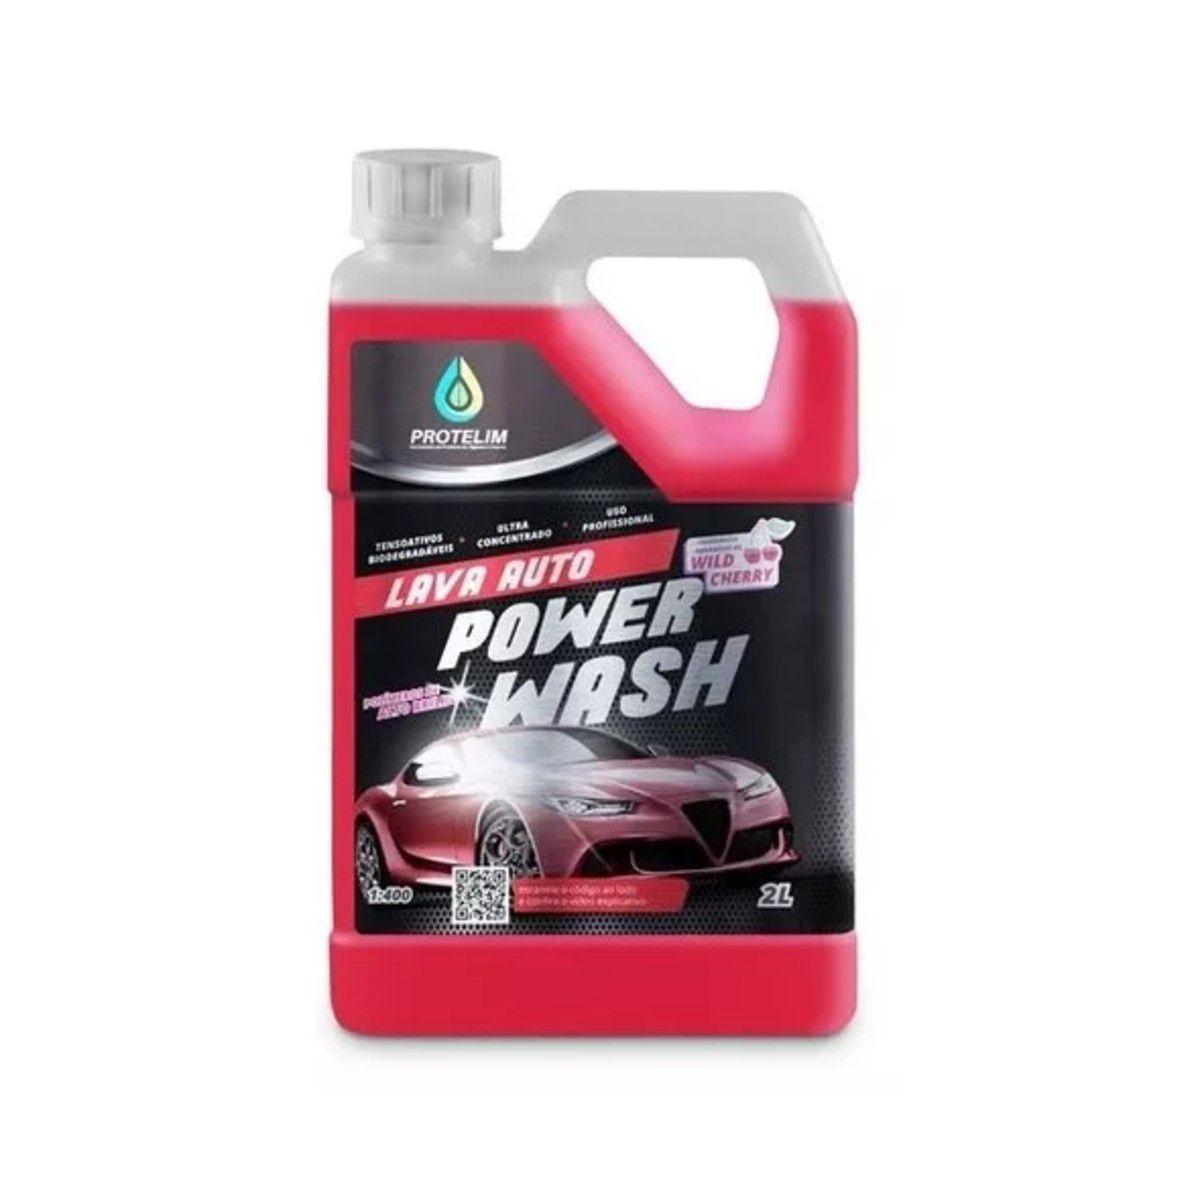 Shampoo Automotivo Lava Auto Power Wash 1:400 Protelim 2,2 Litros